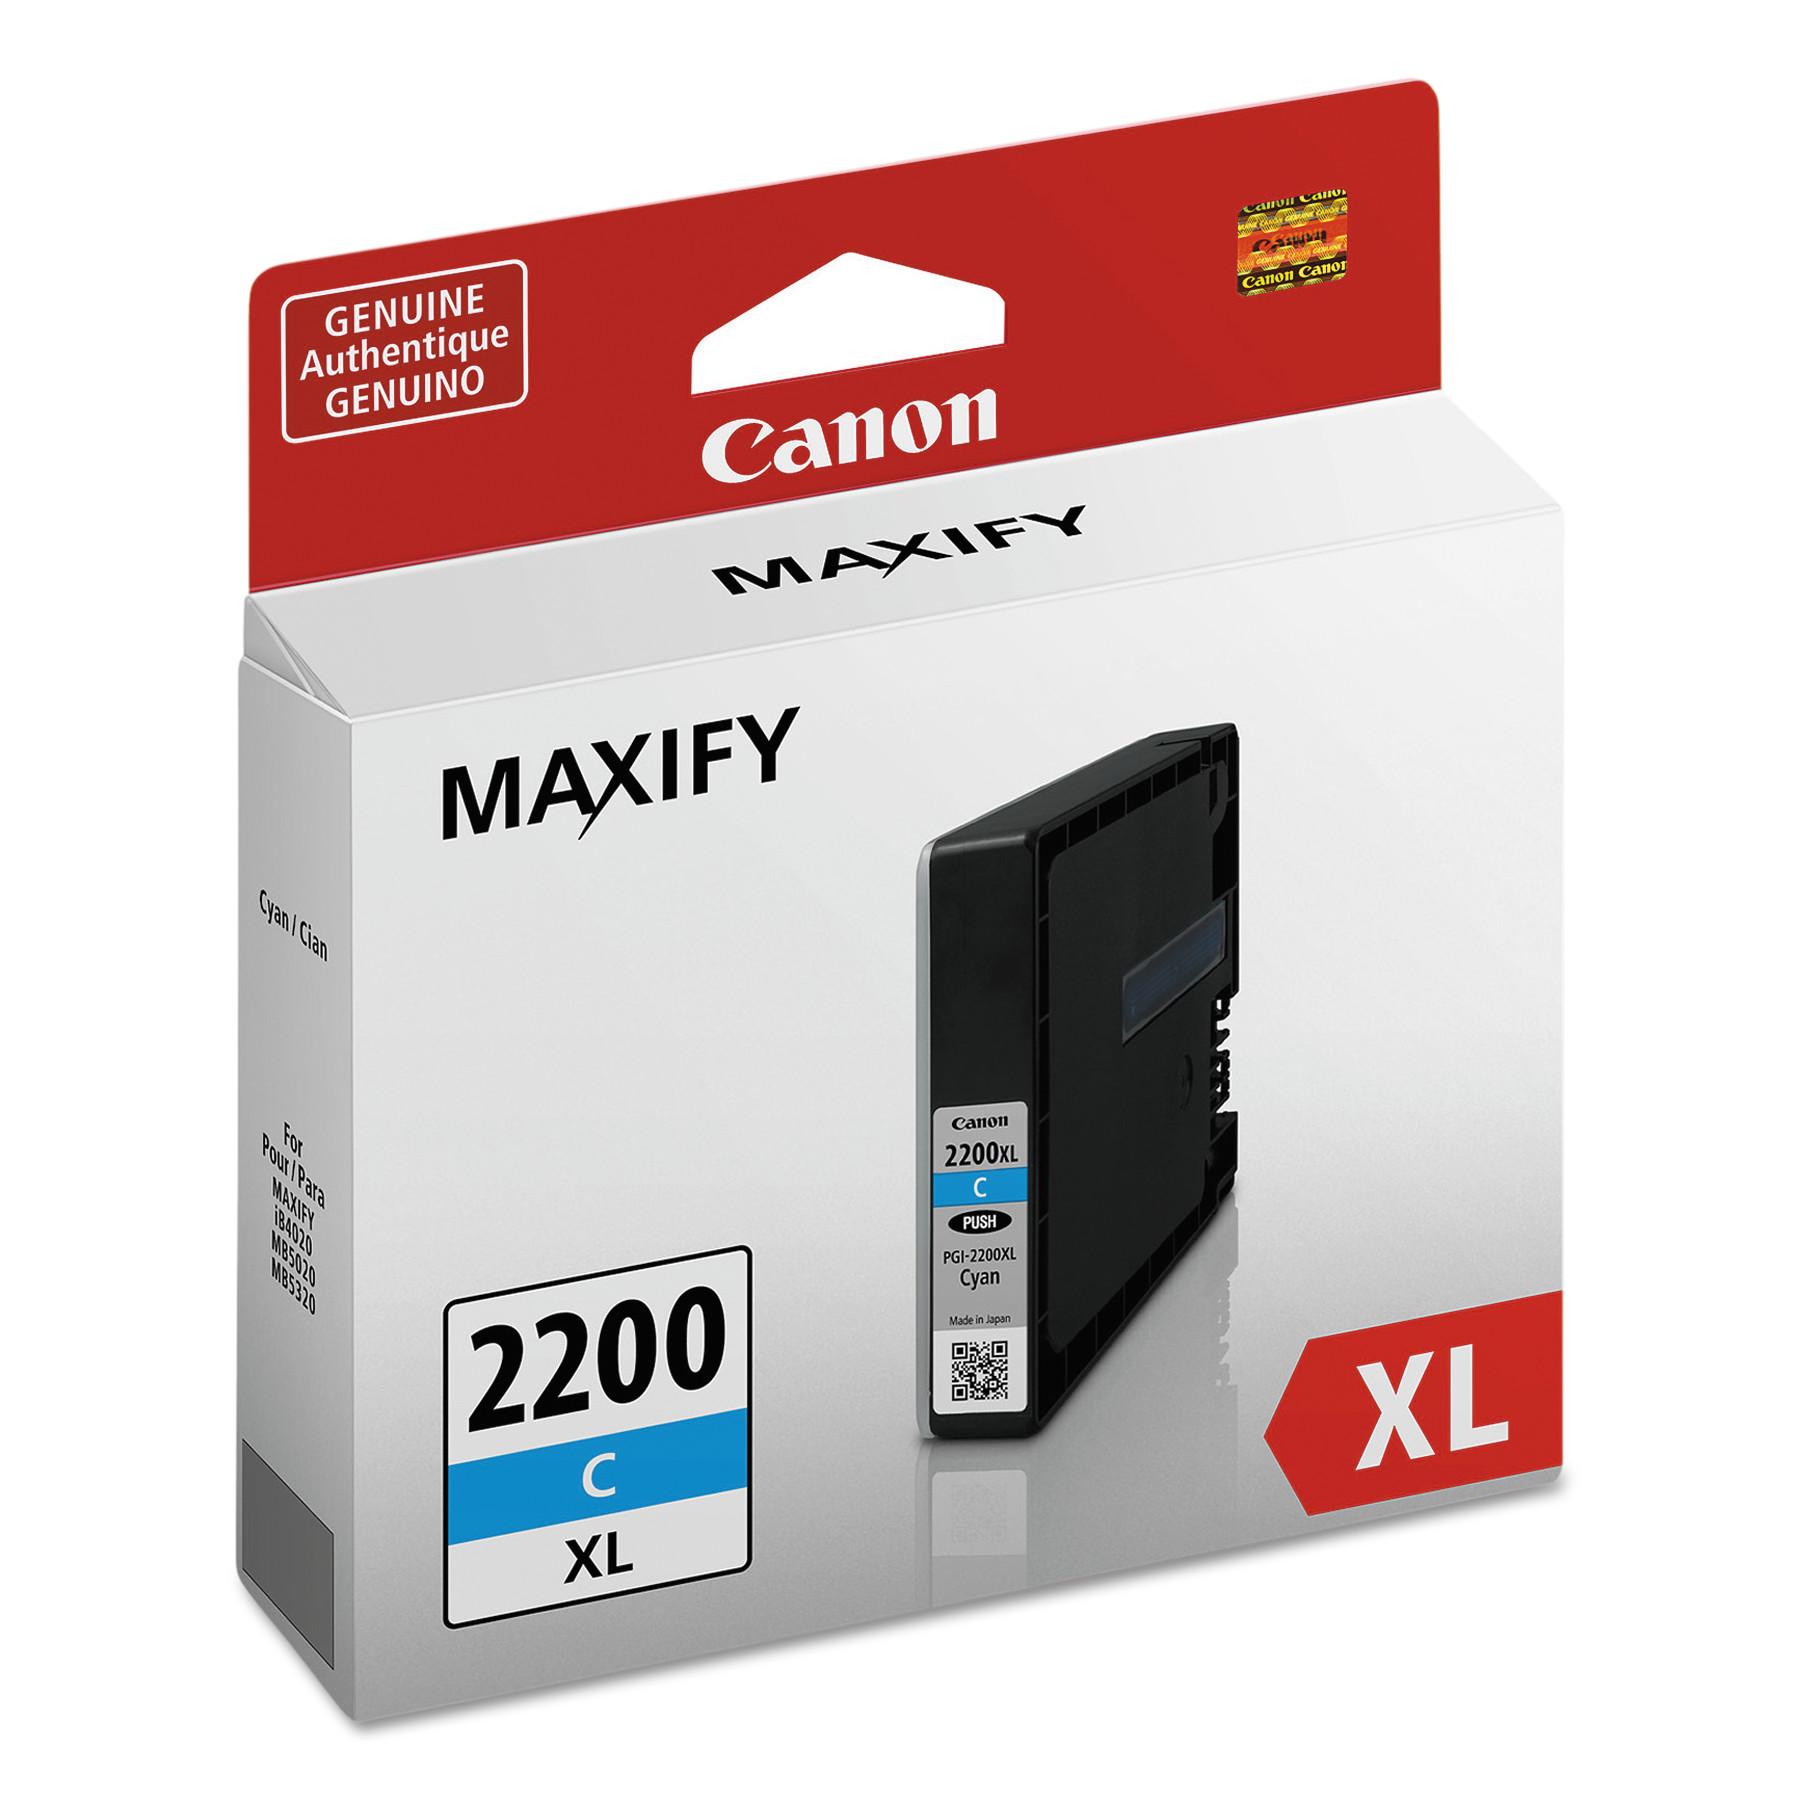 Canon 9268B001 (PGI-2200XL) High-Yield Ink, Cyan